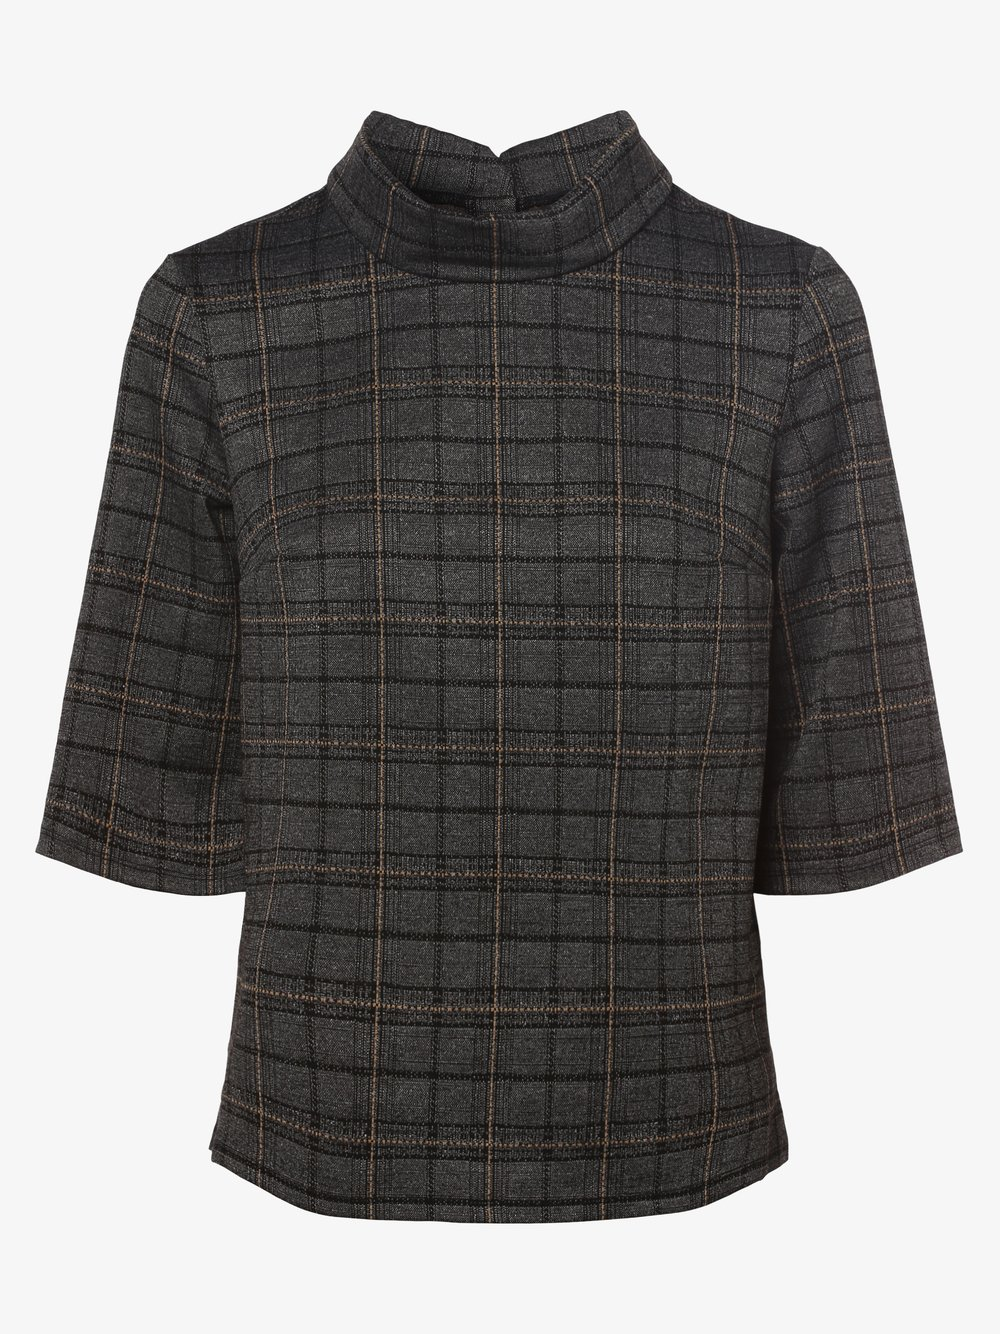 Esprit Collection - Bluzka damska, szary